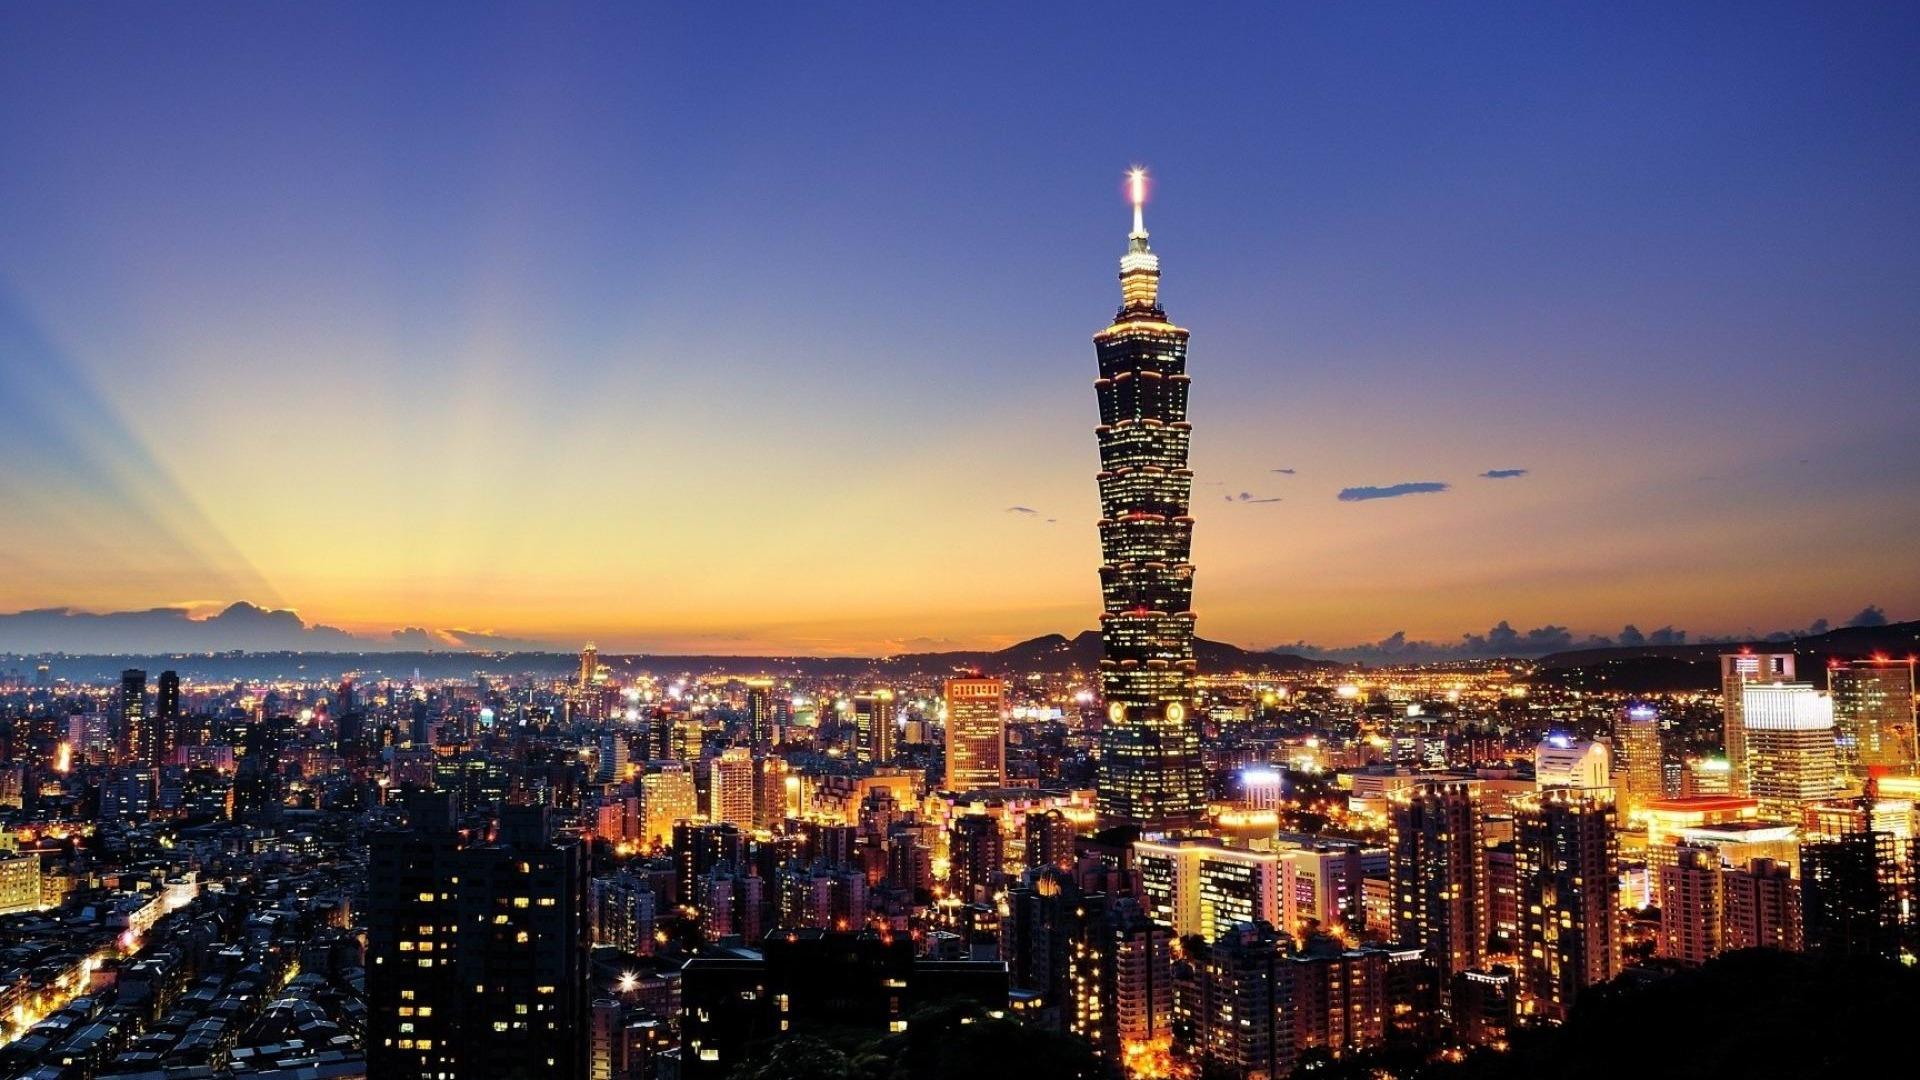 Taiwan Skyscrapers City Night Cities HD Wallpaper